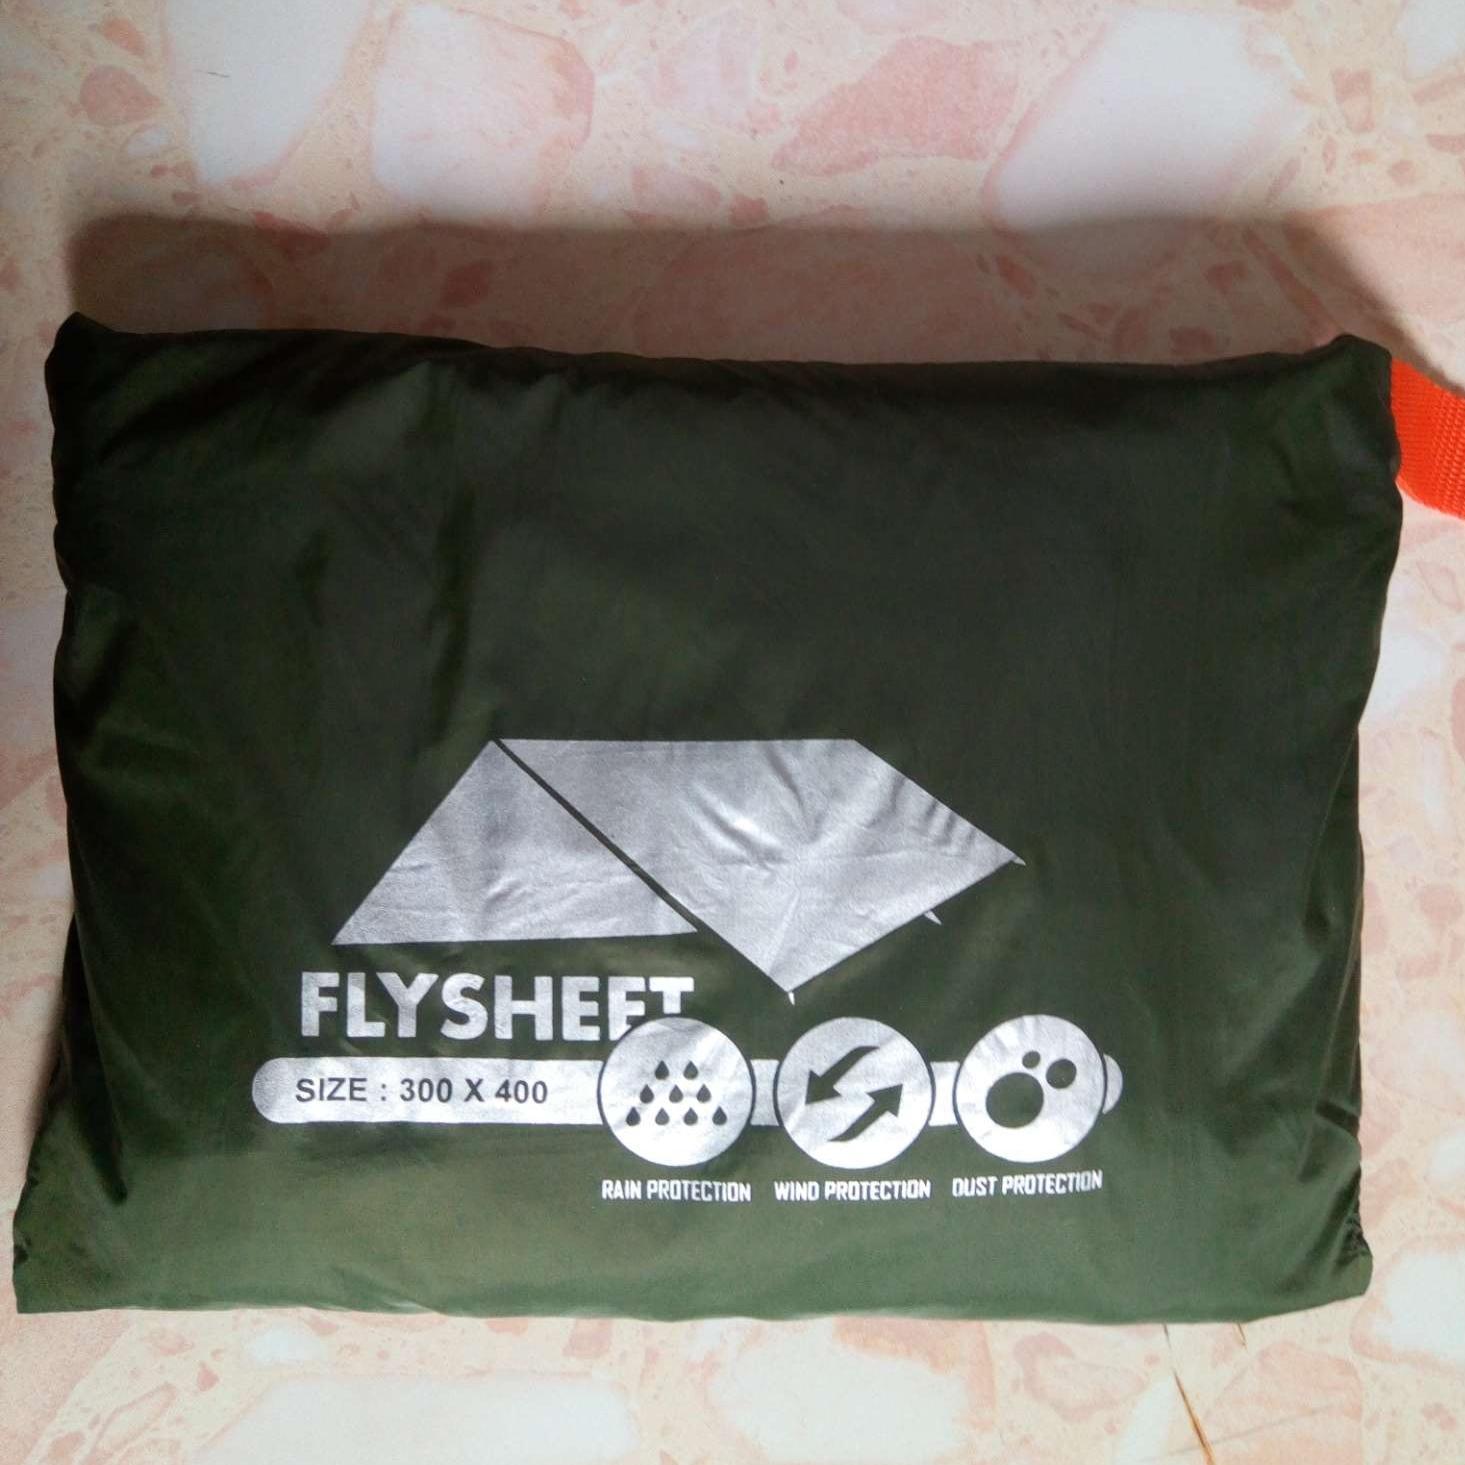 Flysheet 3 x 4 meter - lapisan tenda waterproof - kain waterproof - tarp bivak